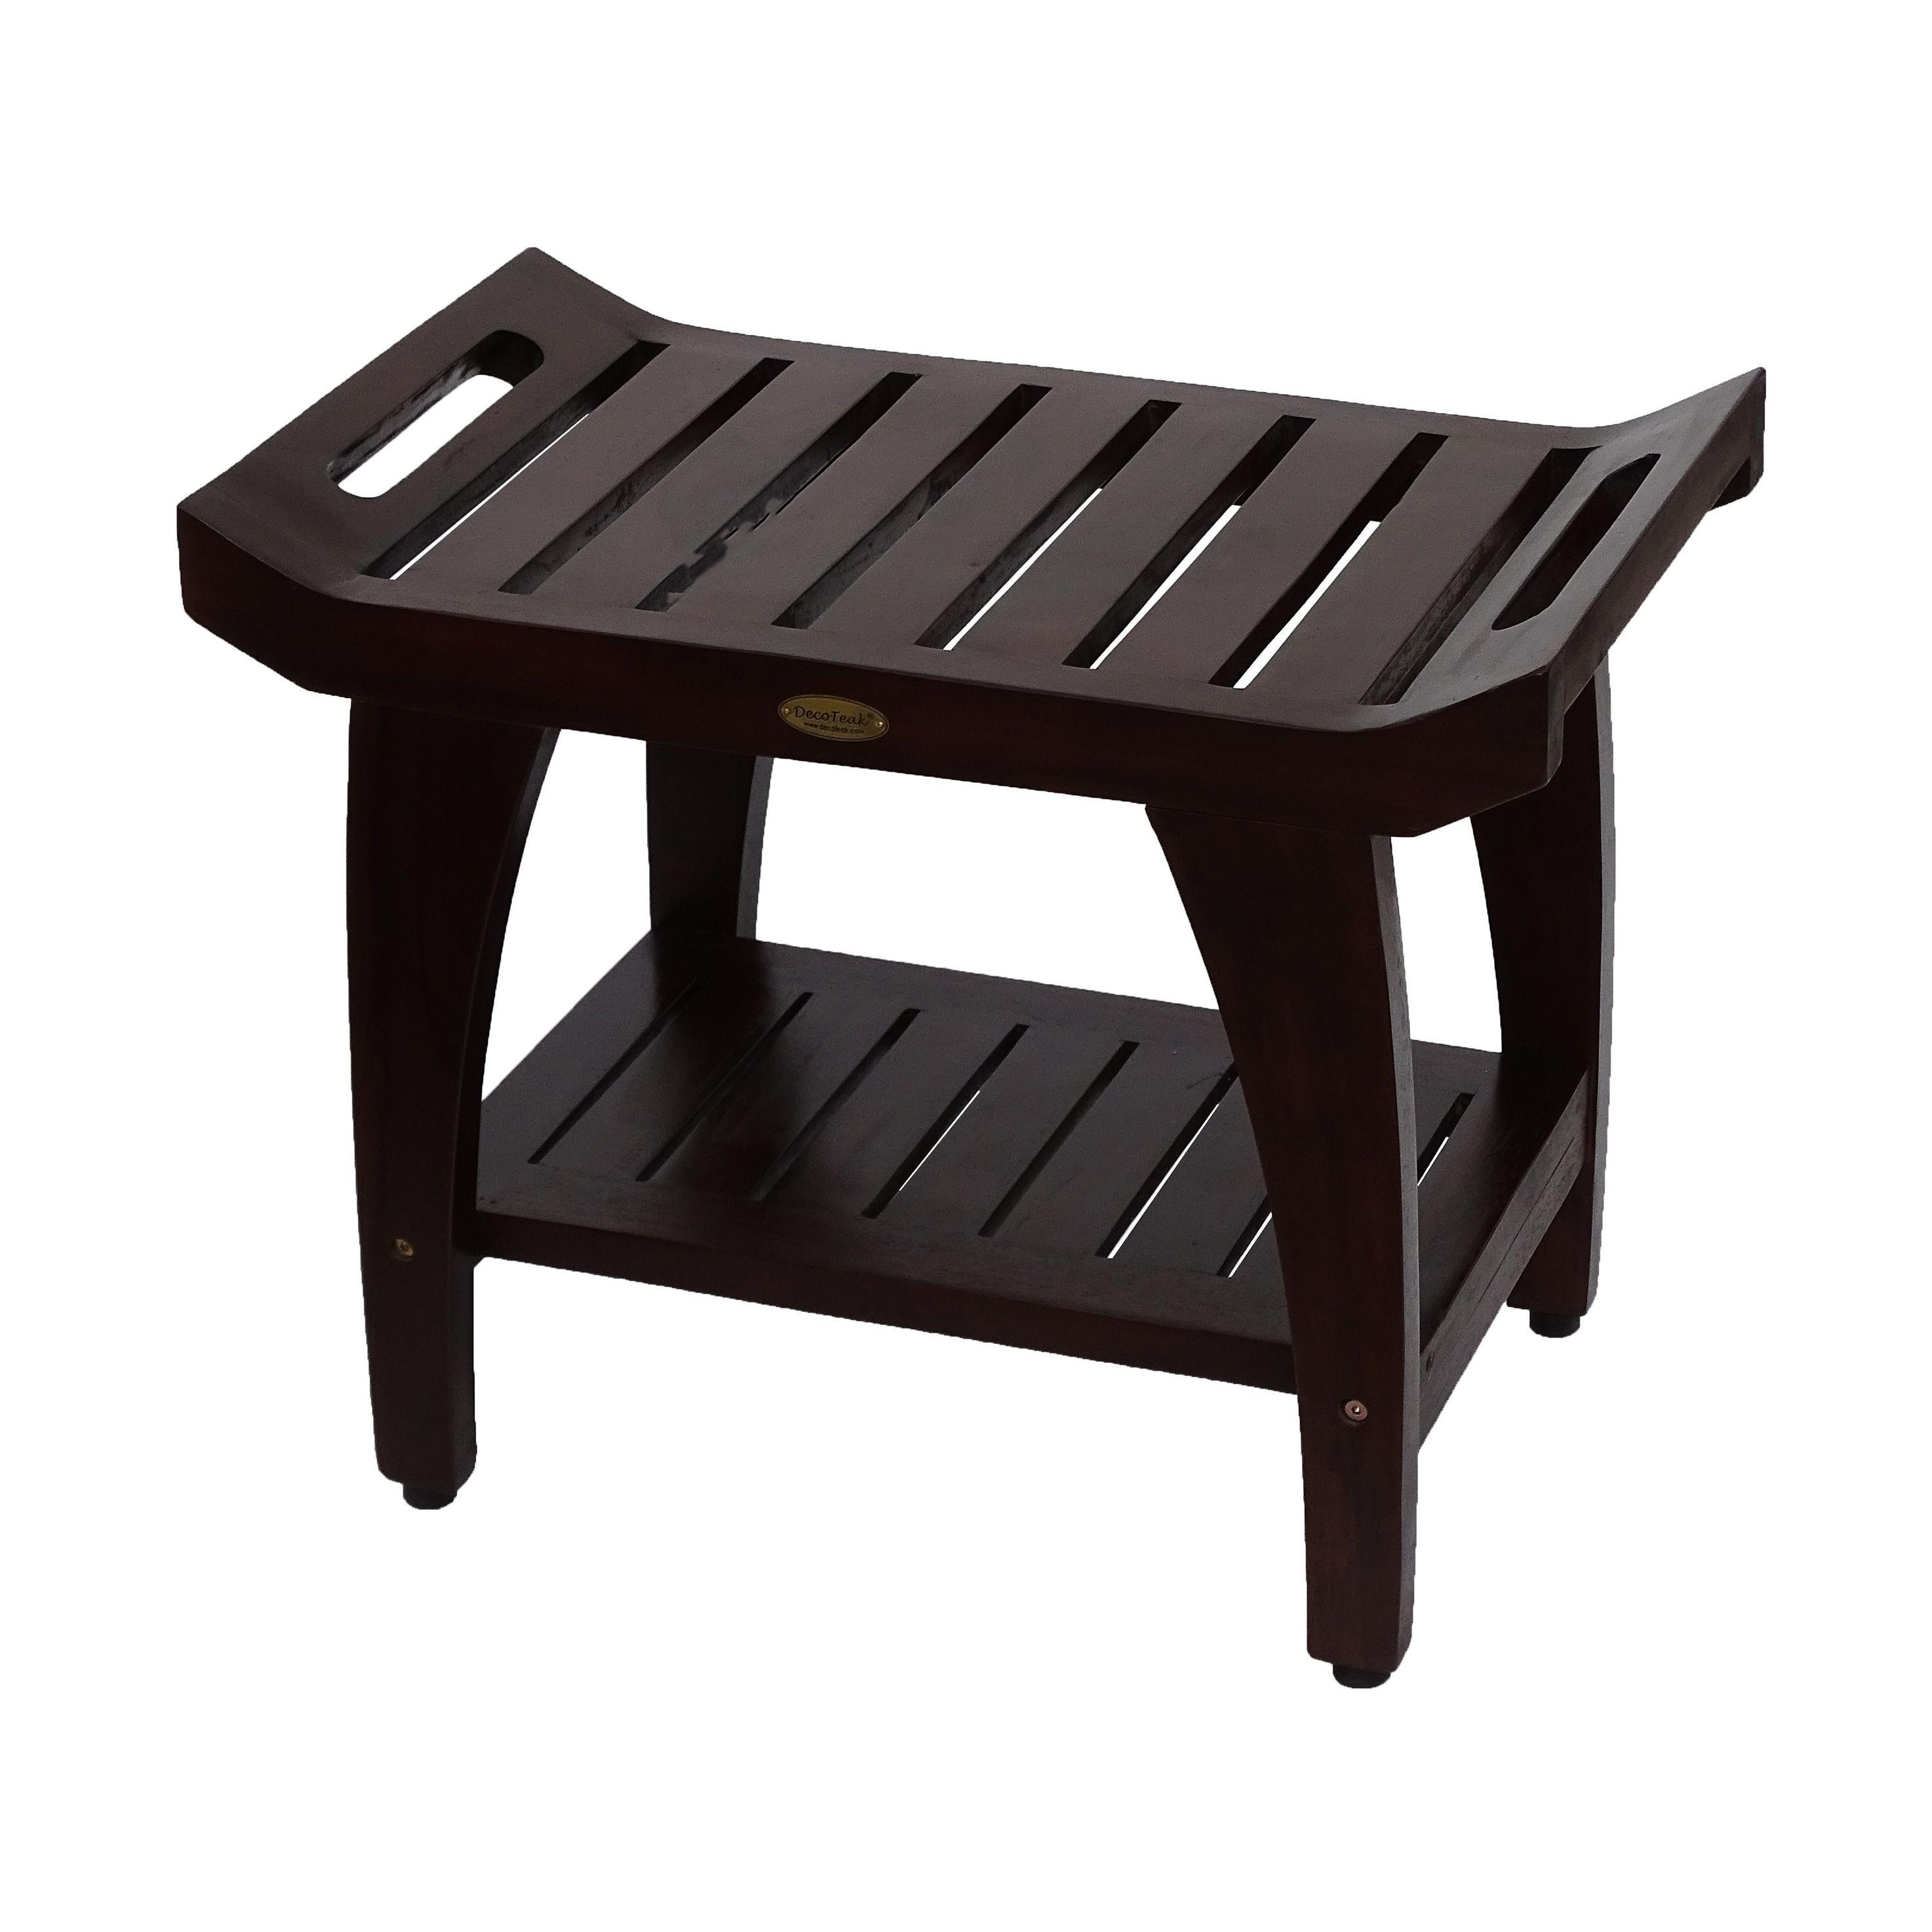 24 Decoteak Tranquility Shower Bench With Large Storage Shelf